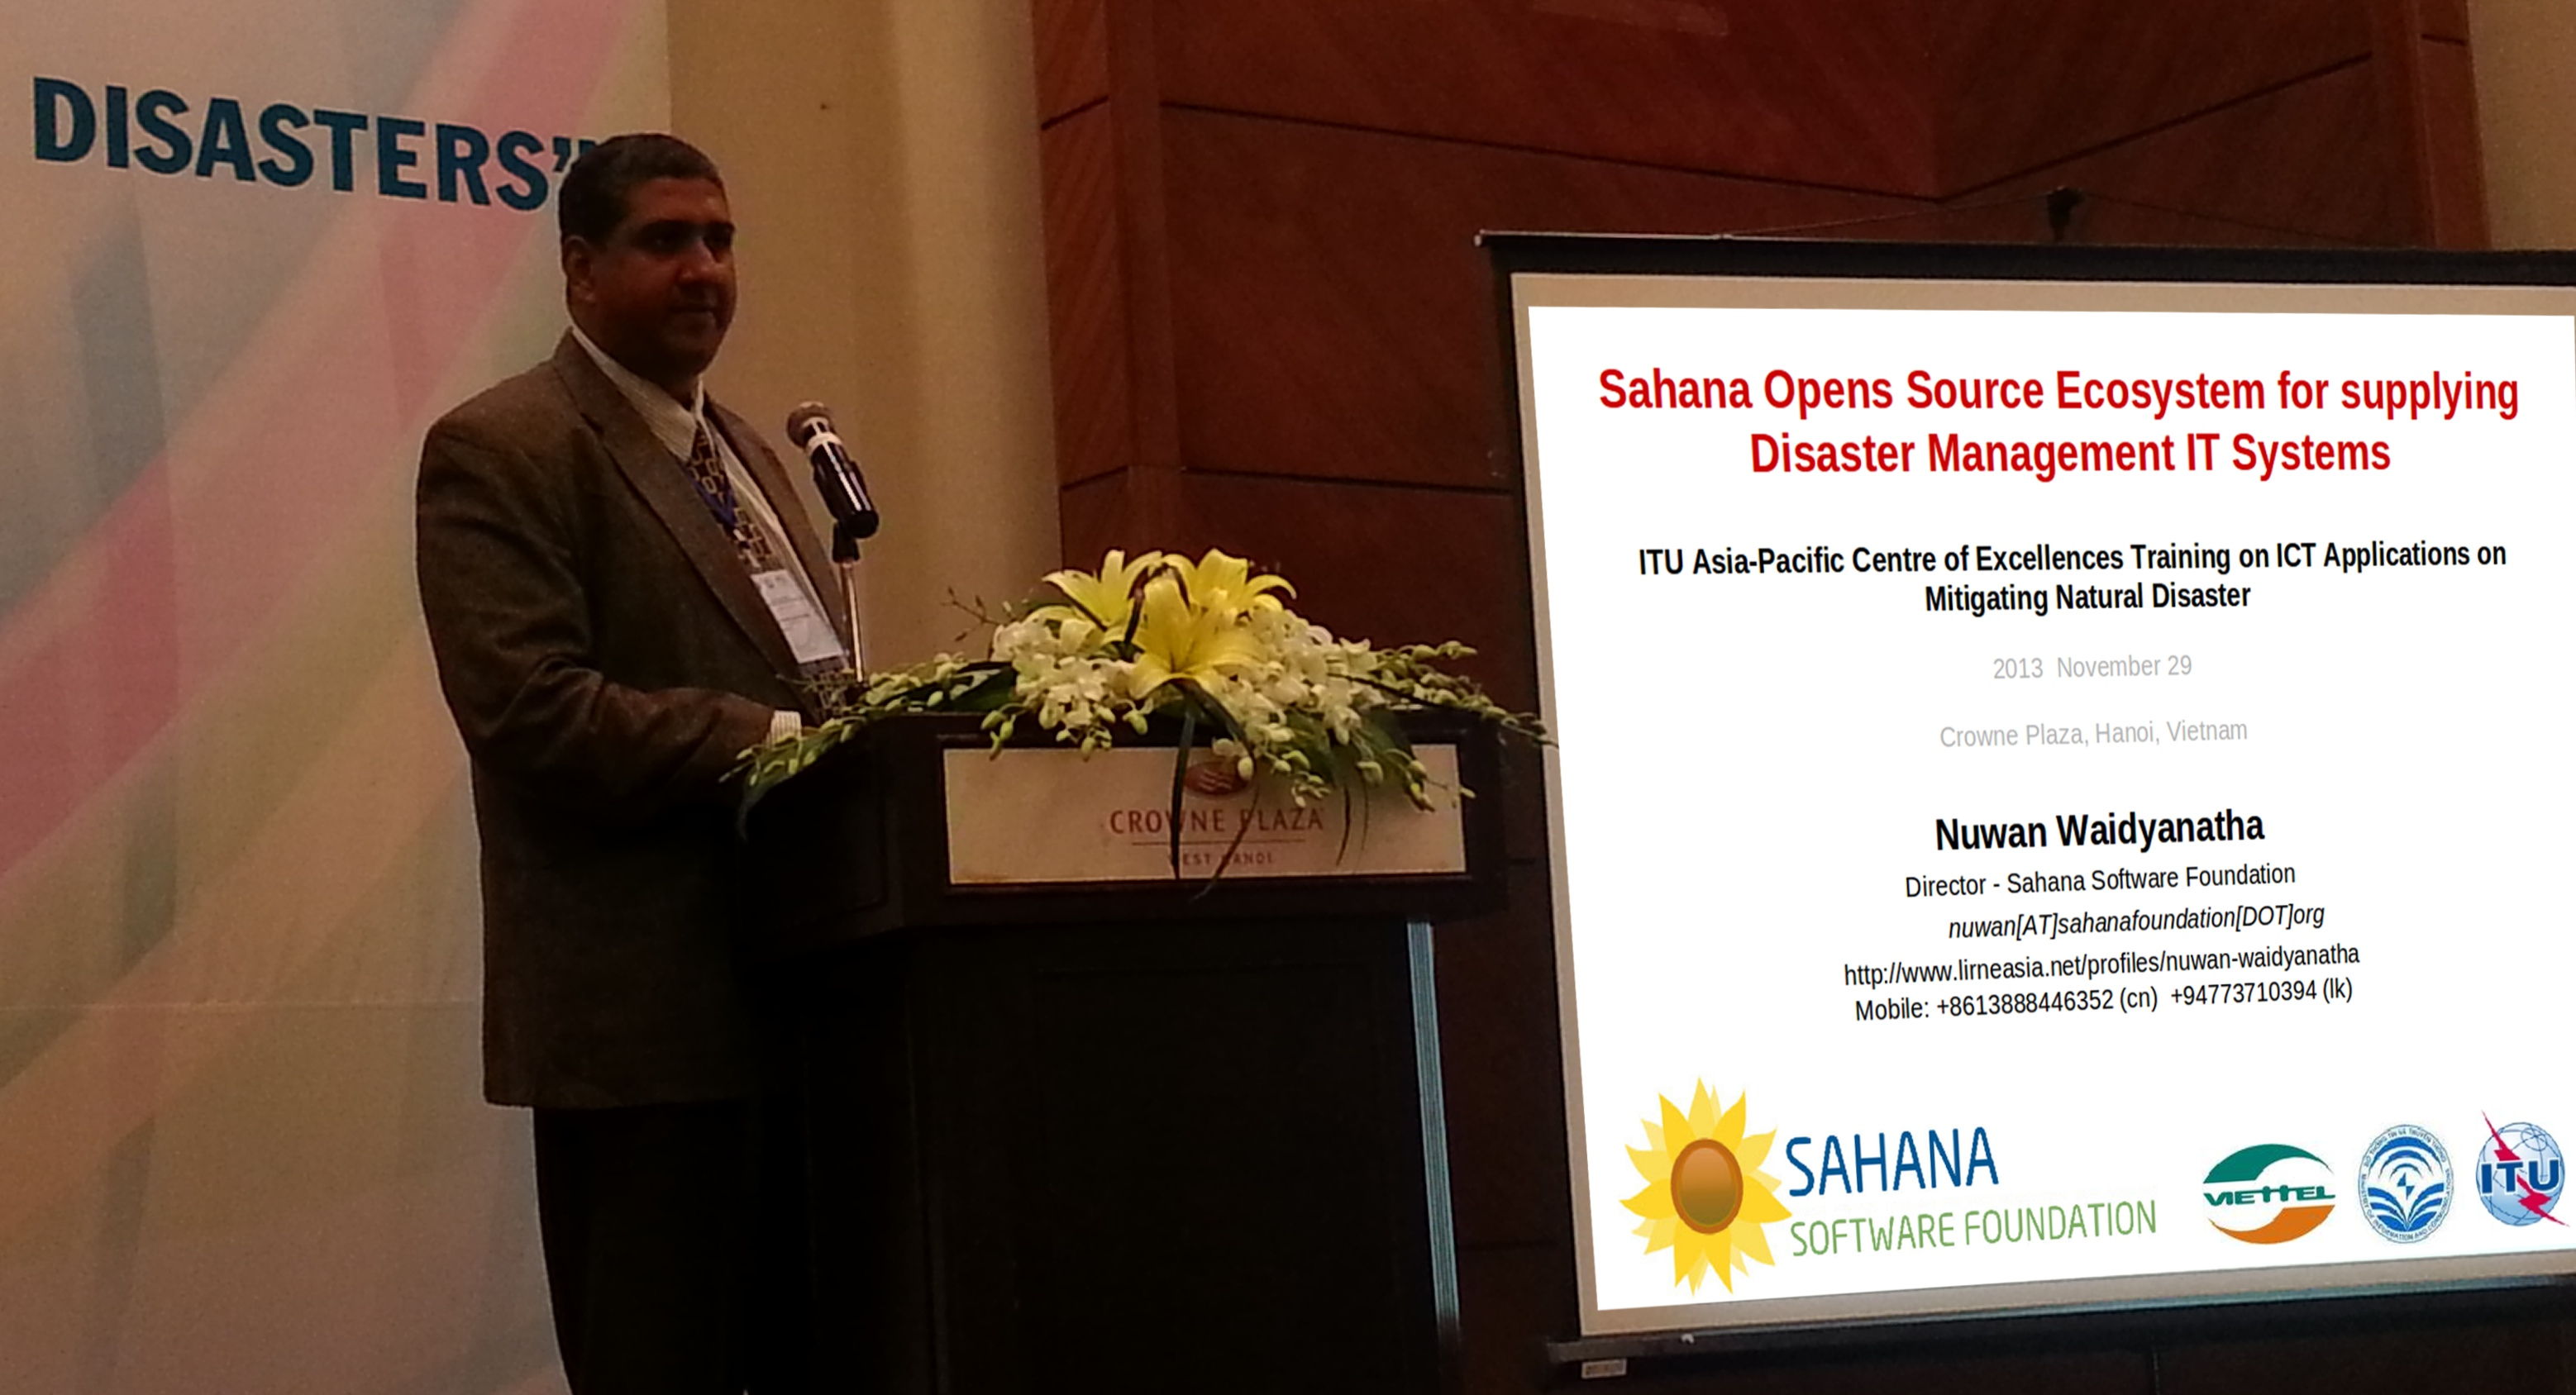 The Sahana Ecosystem for Disaster Mitigation presented @ITU in Hanoi